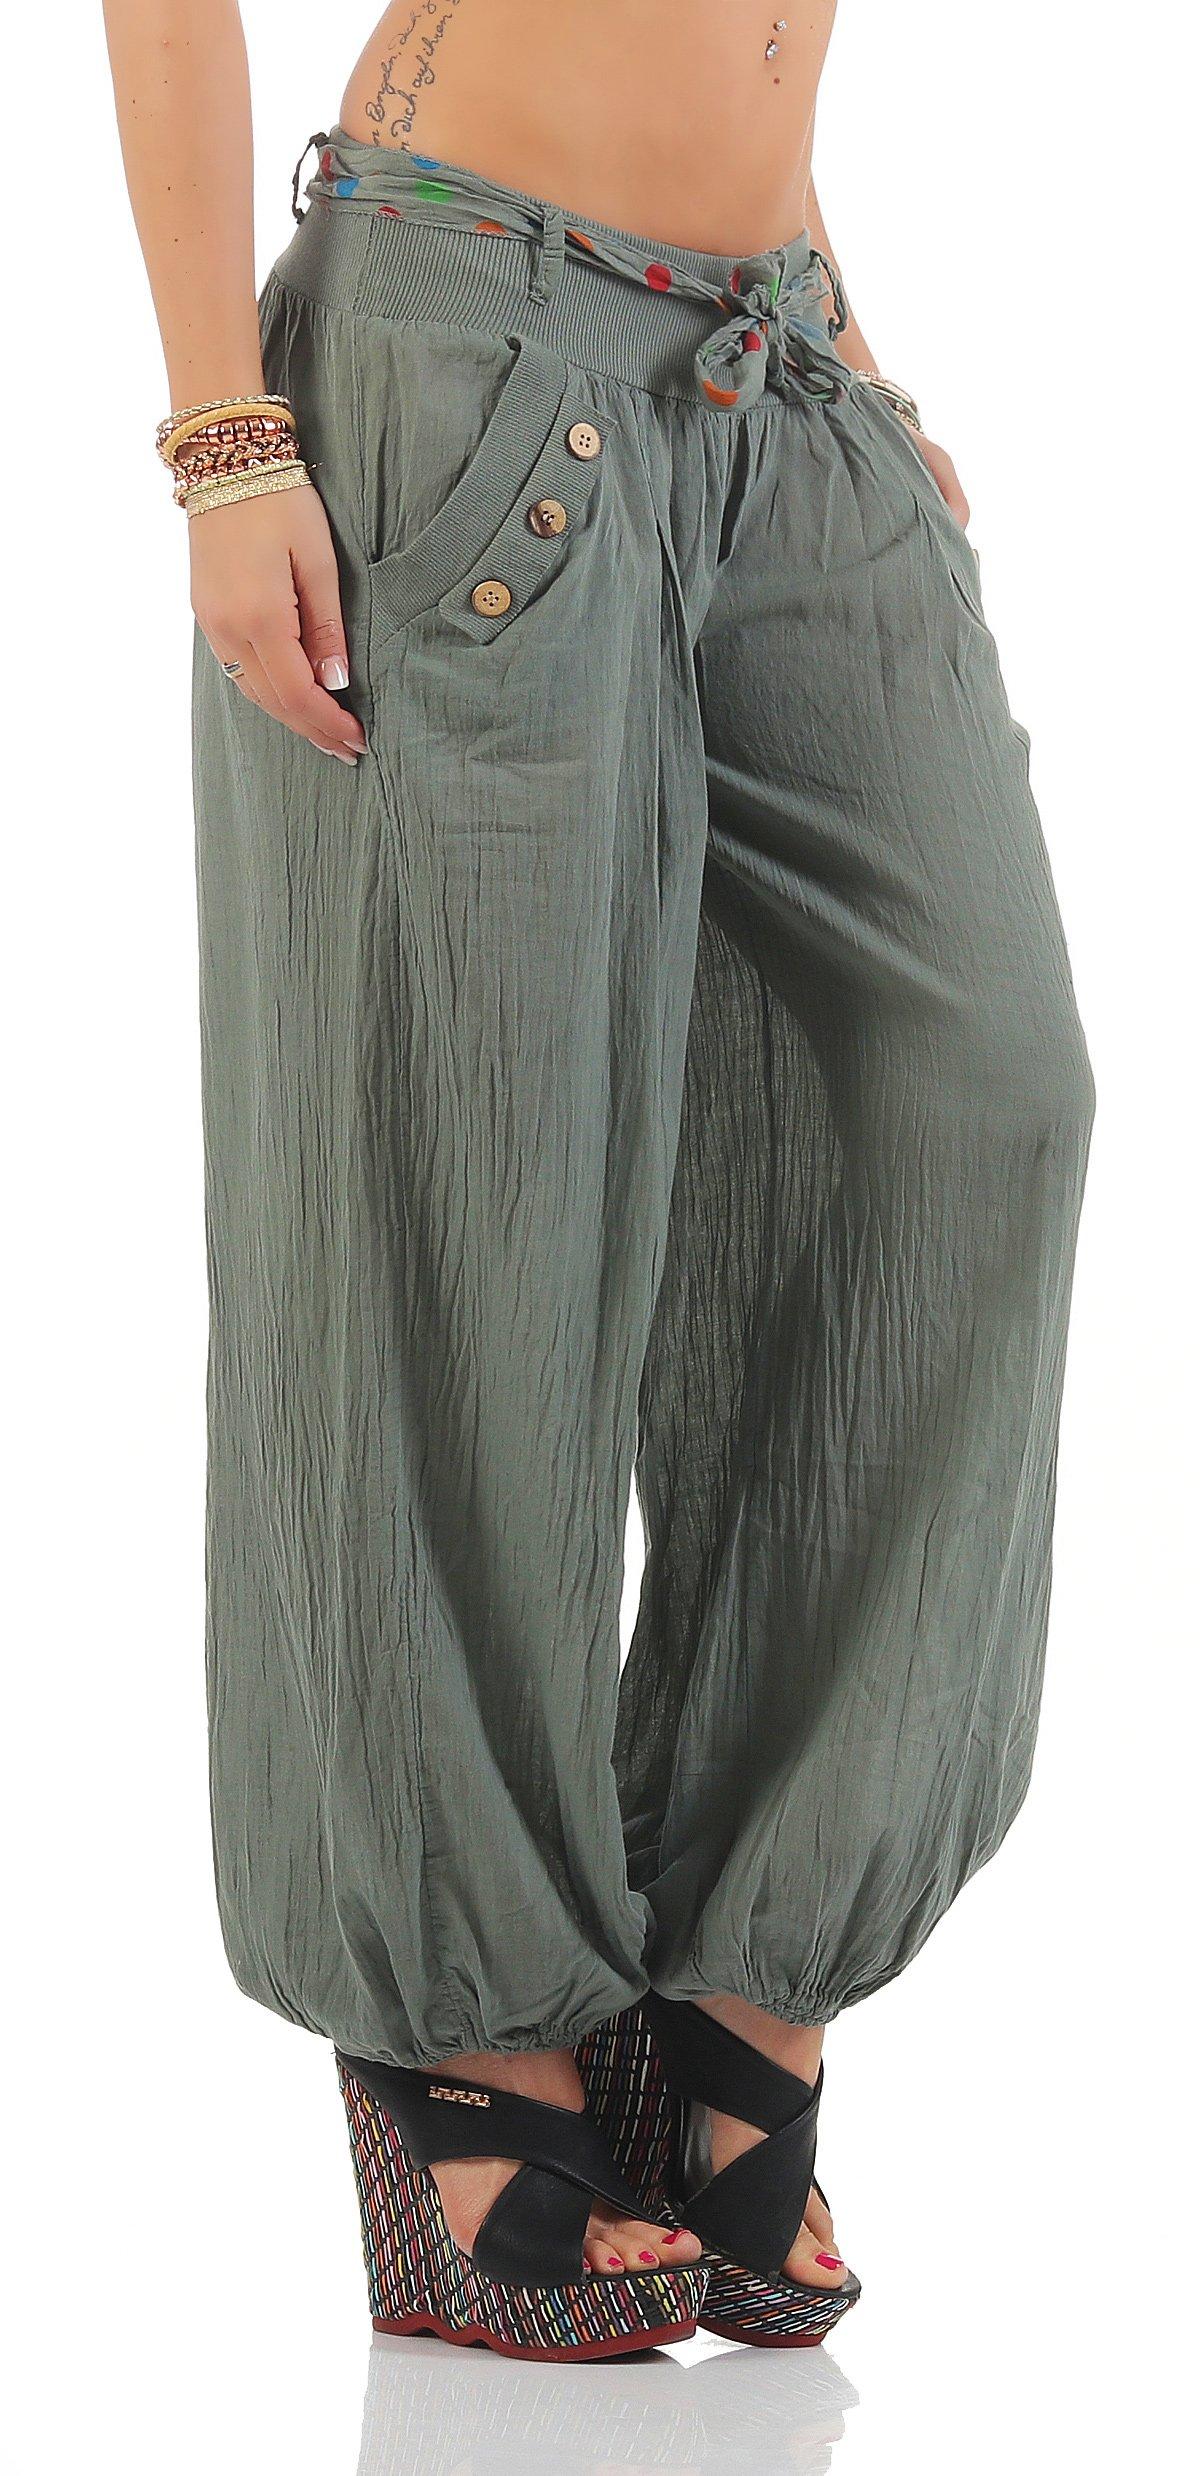 Moda Italy Pantaloni Harem con cintura Pantaloni a sbuffo Colori Uni  Pantaloni a palloncino Pantaloni alla turca Harem Pantaloncini Estivi Yoga  taglia unica de7770b3fd4